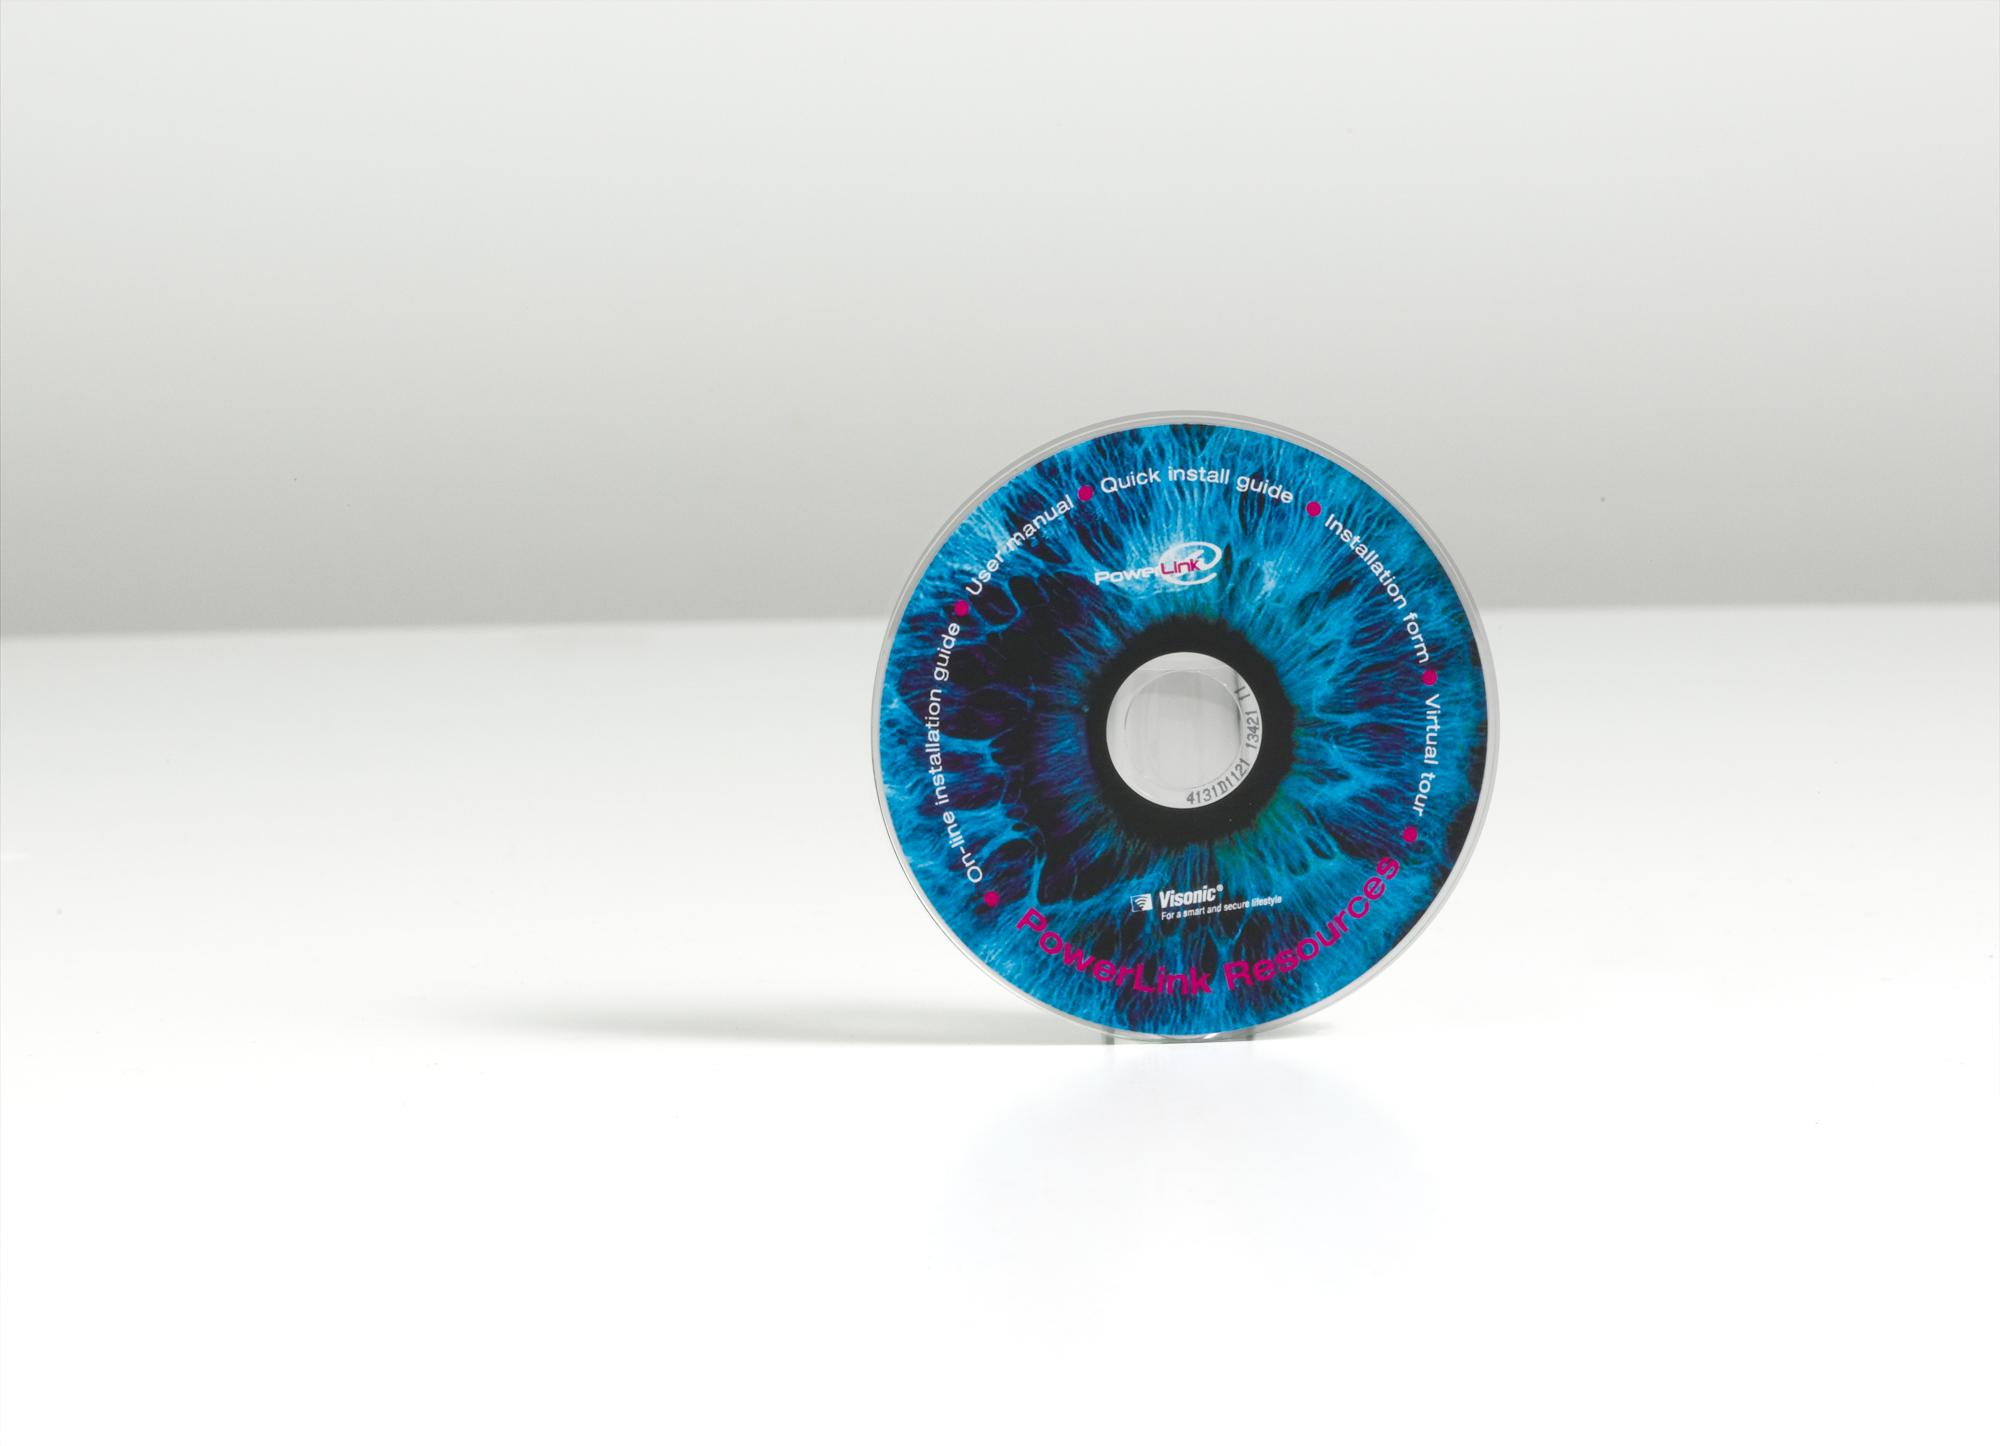 PowerLink Project- Application Mini Dvd Design